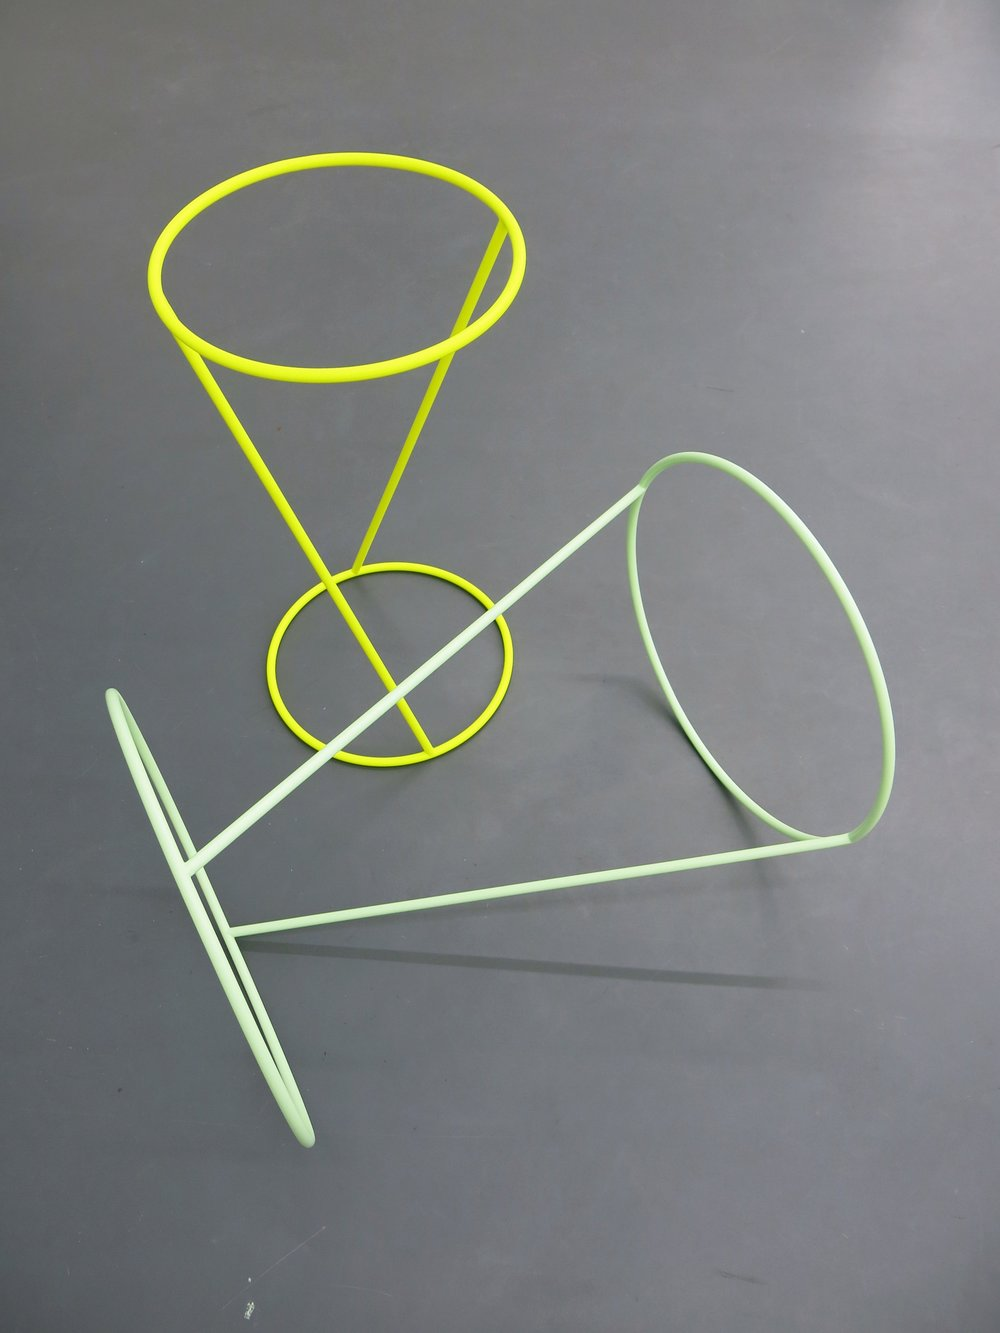 I'll Be Your Mirror, 2012  Stahl bemalt gelb 70 x 40 cm,grün 50 x 70 cm